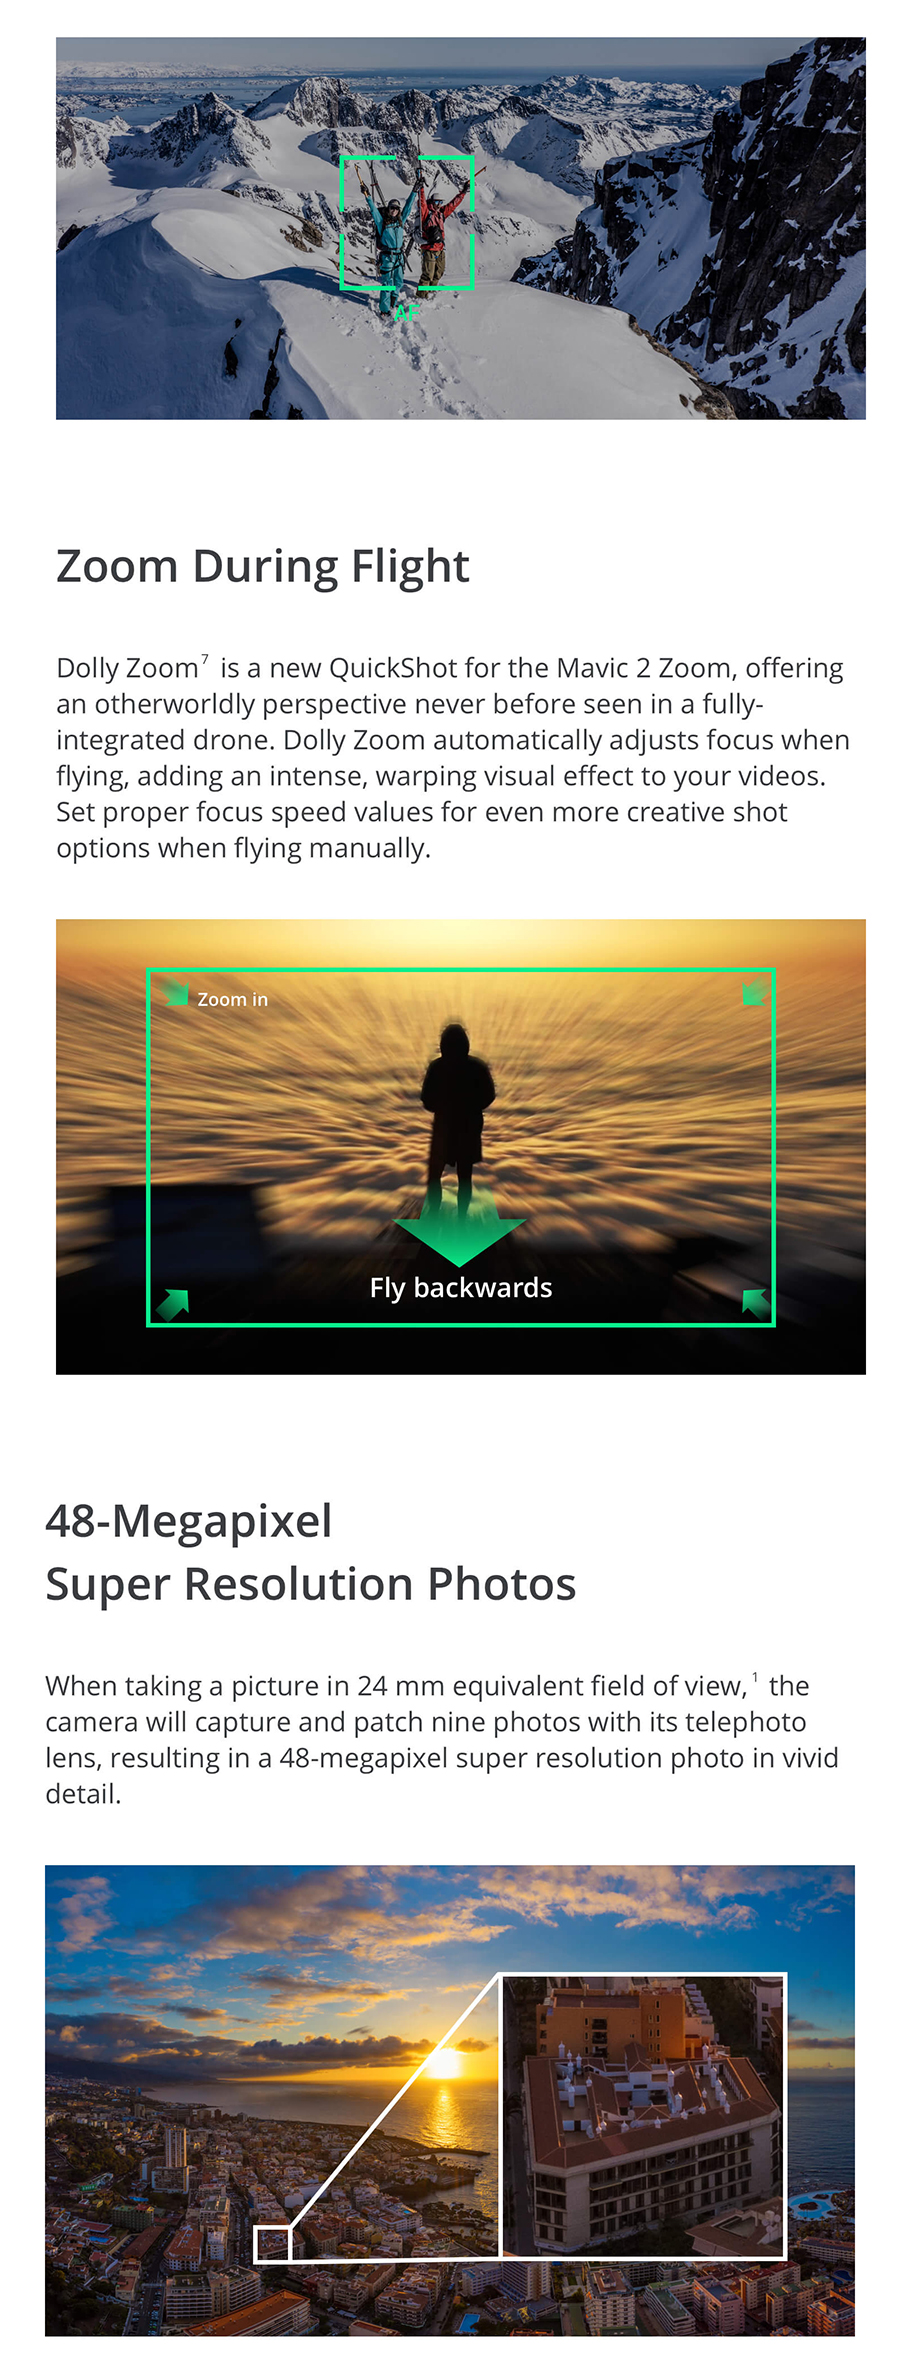 DJI Mavic 2 Zoom Drone,2x Optical Zoom 4x Lossless FHD Video 48MP Super  Resolution Photos 31Mins Flight Time 8km Remote Control